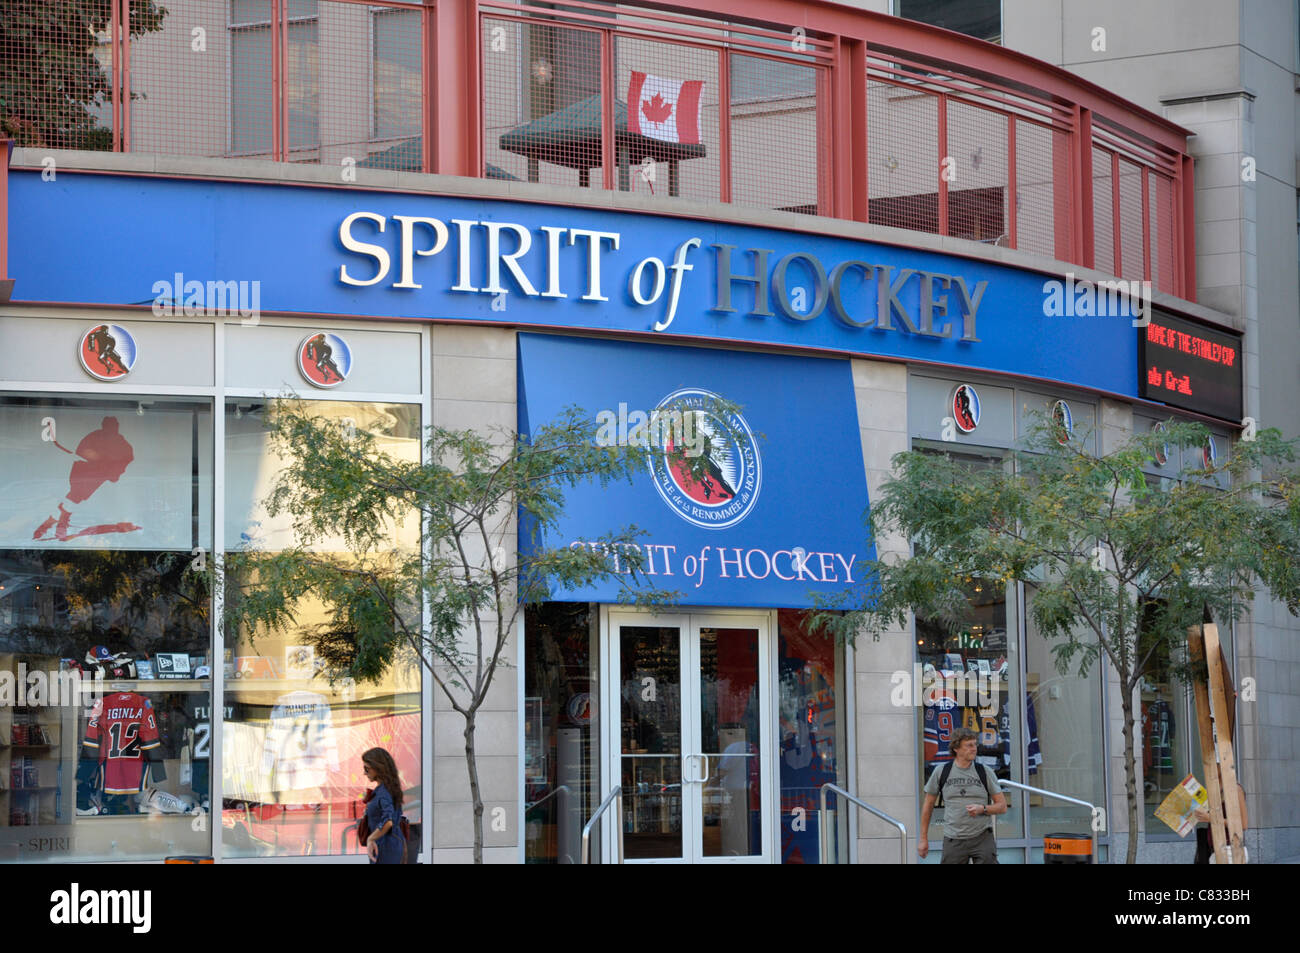 Espíritu de hockey, al lado de la tienda de Hockey Hall of Fame, Toronto Imagen De Stock